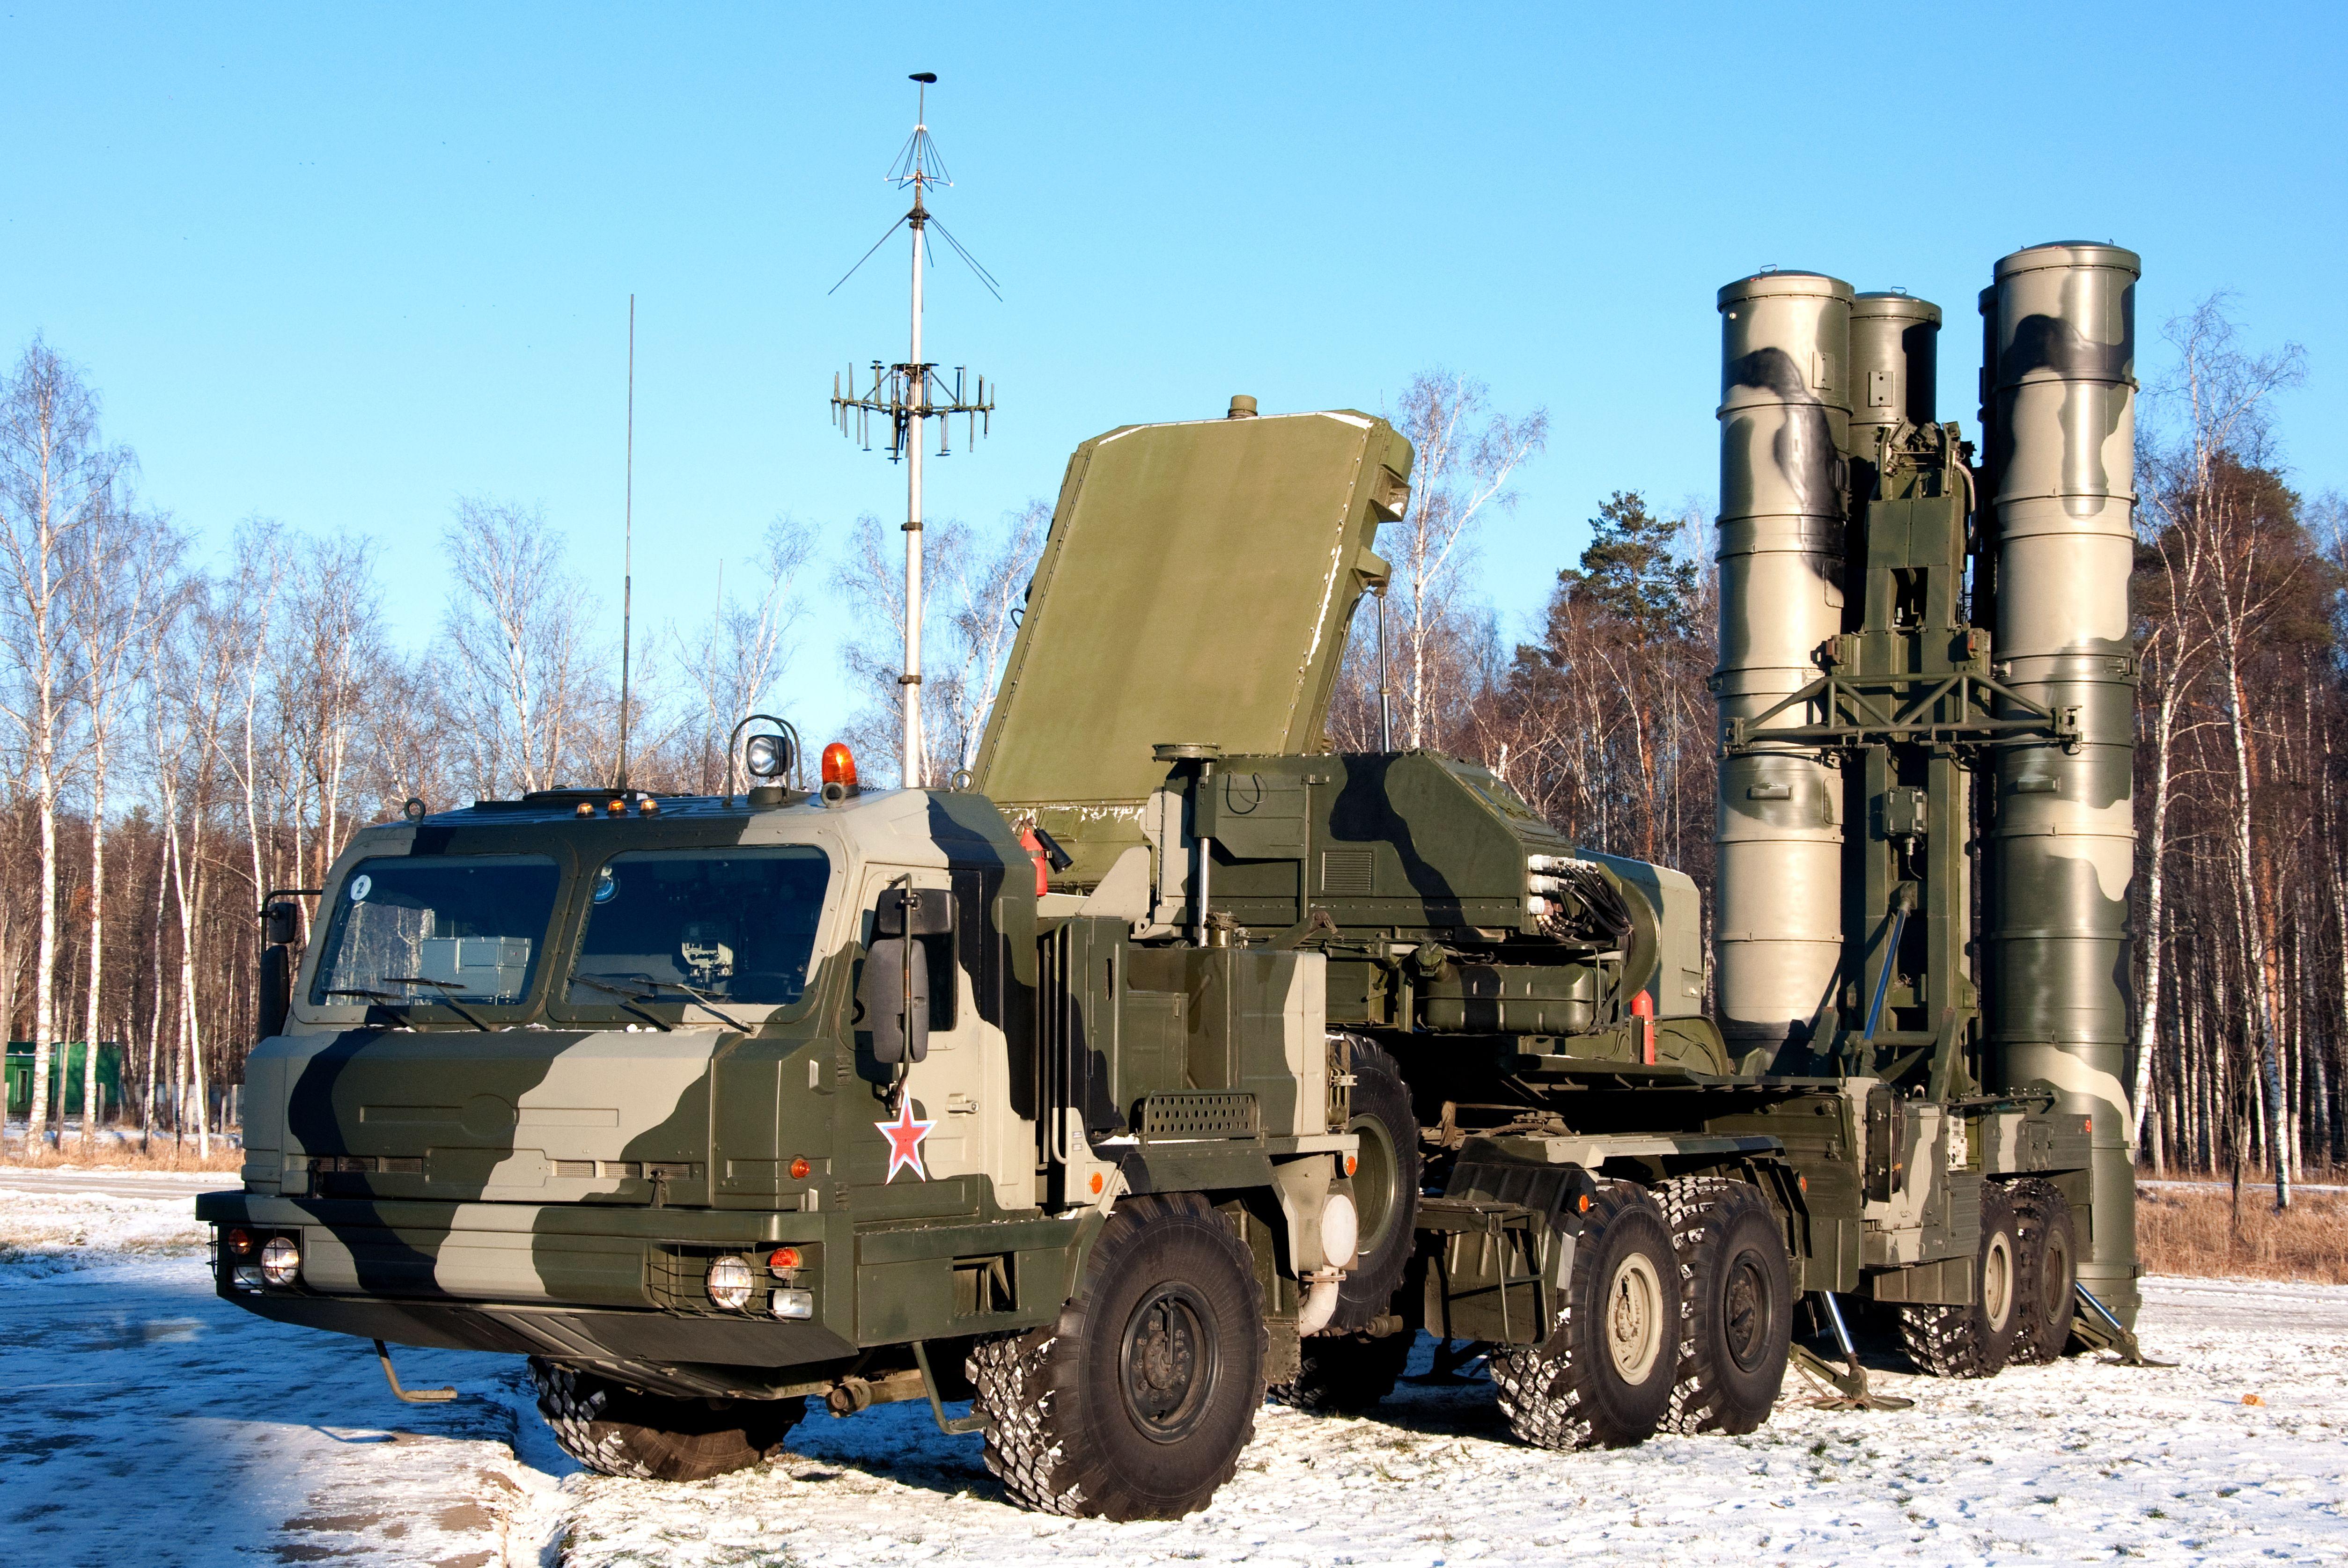 http://modernweapon.ru/images/zsu/s-400_1.jpg